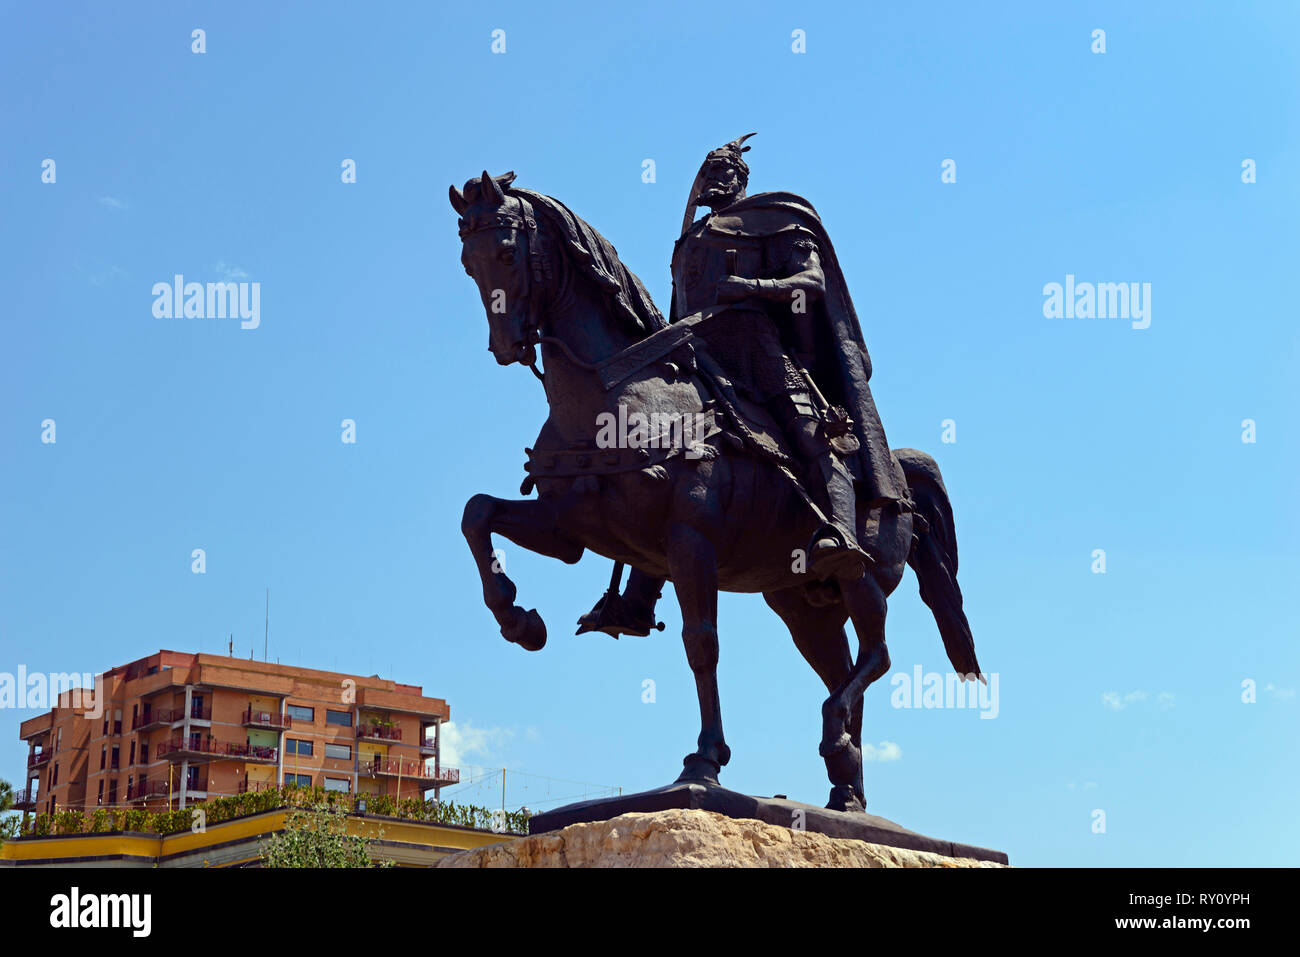 Skanderbeg monument, equestrian statue Skenderbej, Albanian national hero Skanderbeg, Skanderbeg Square, Tirana, Albania - Stock Image